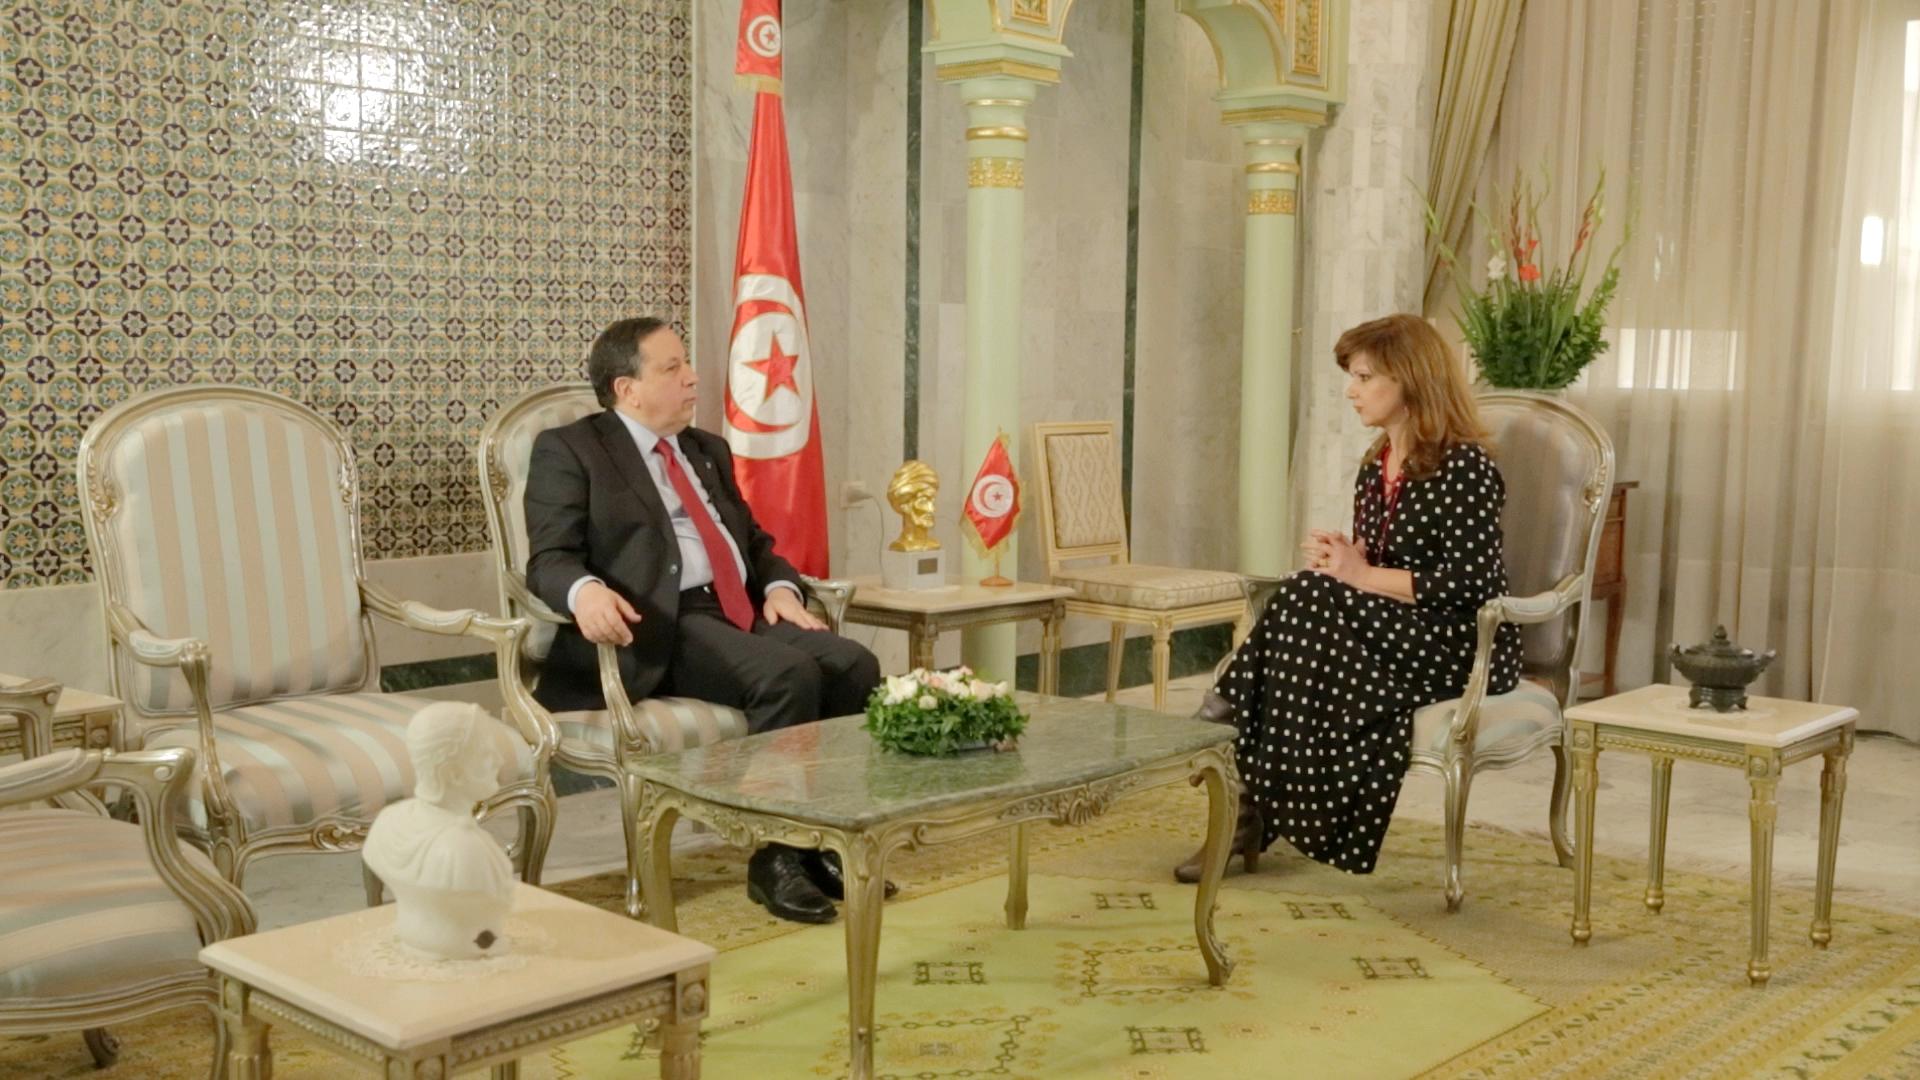 o υπουργός Εξωτερικών της Τυνησίας, Khemaies Jhinaoui, με την Έλενα Κατρίτση